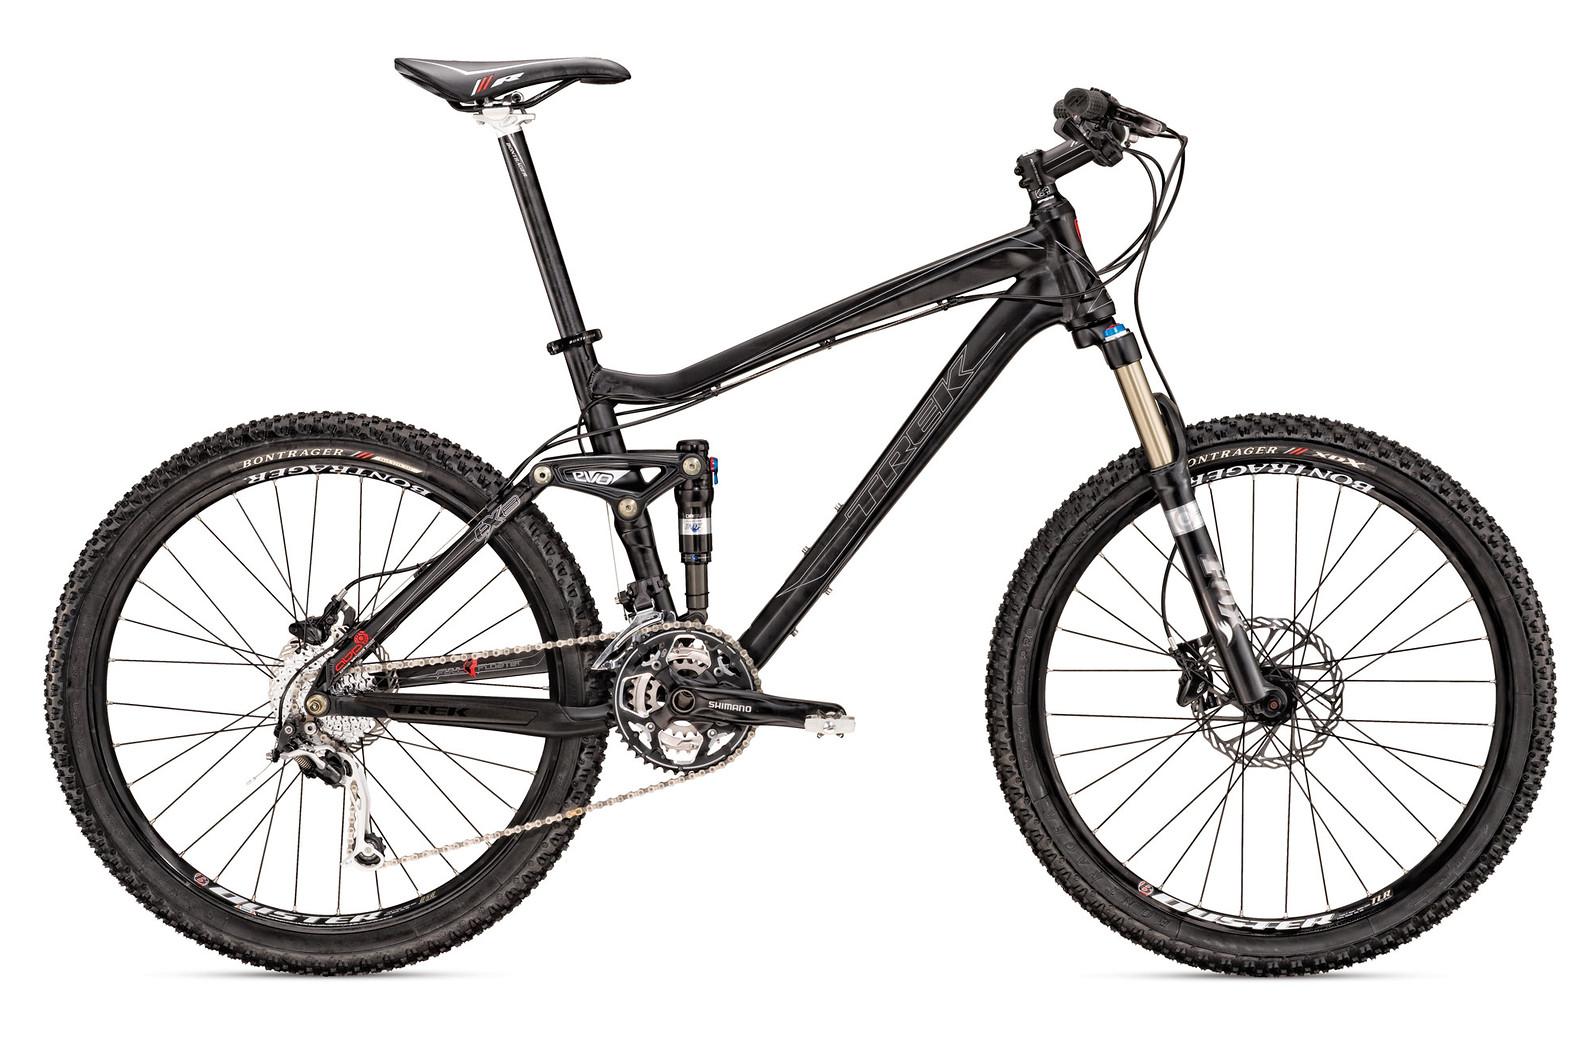 2010 Trek EX 8 Bike fuelex8_black